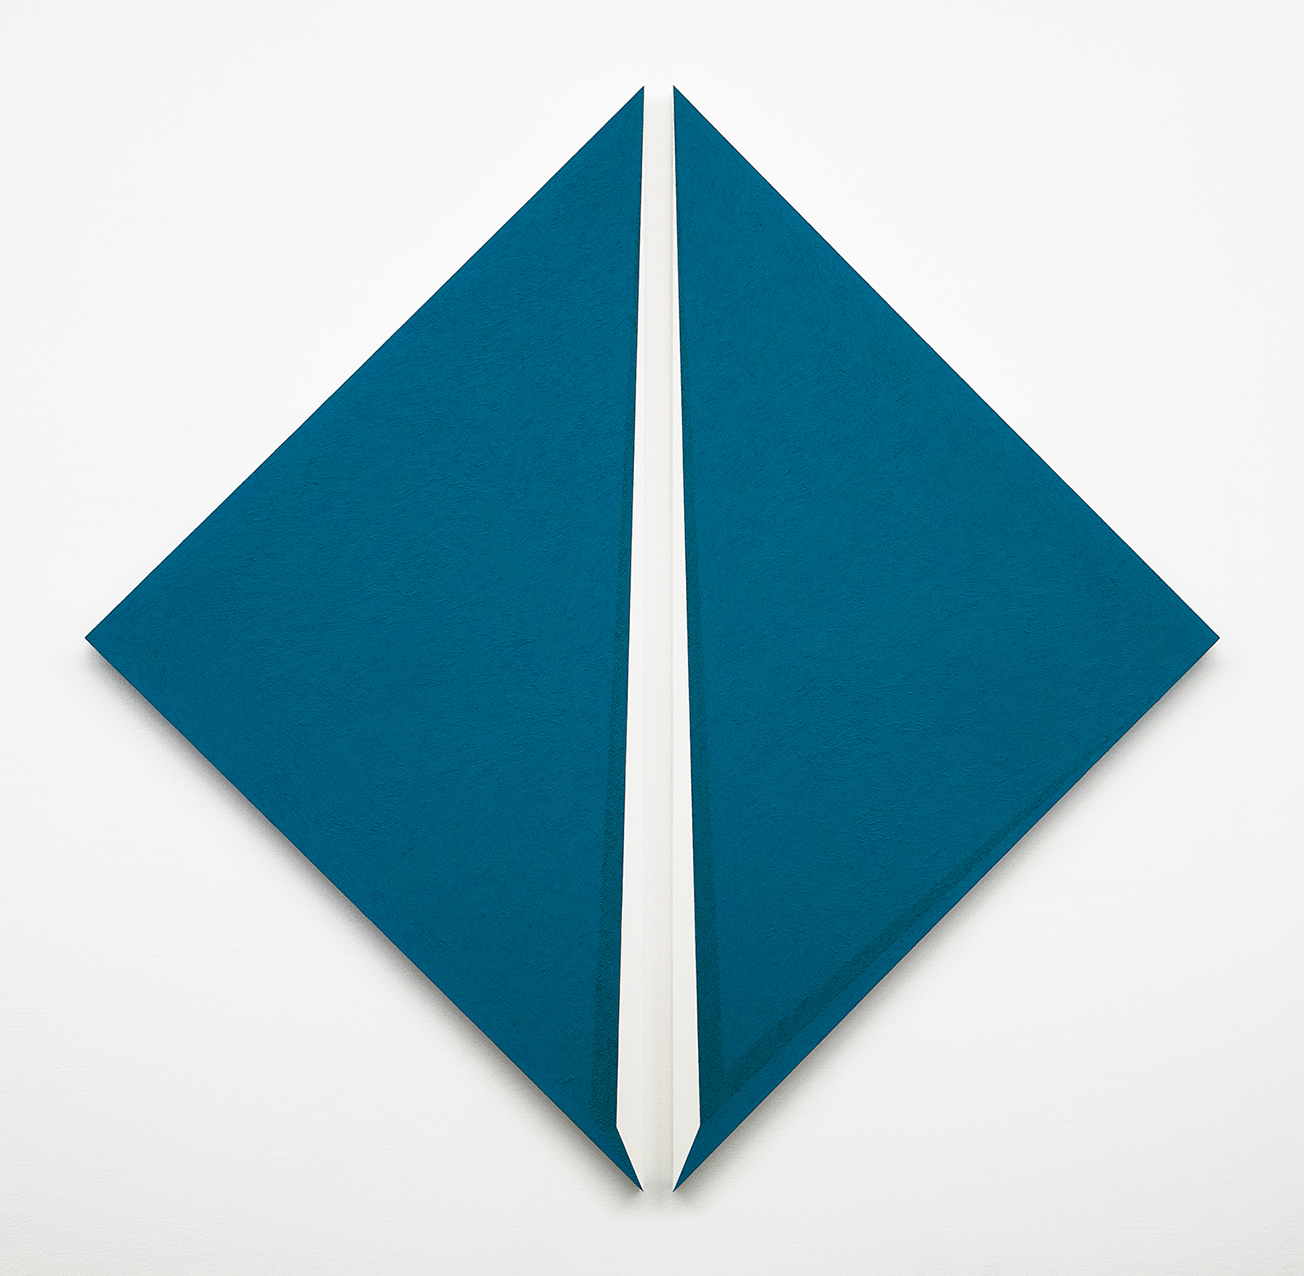 Ignazio Gadaleta, Virtuale, 1993, olio su tavola, 141,7 x 145,2 x 3,5 cm | Milano, Museo del Novecento